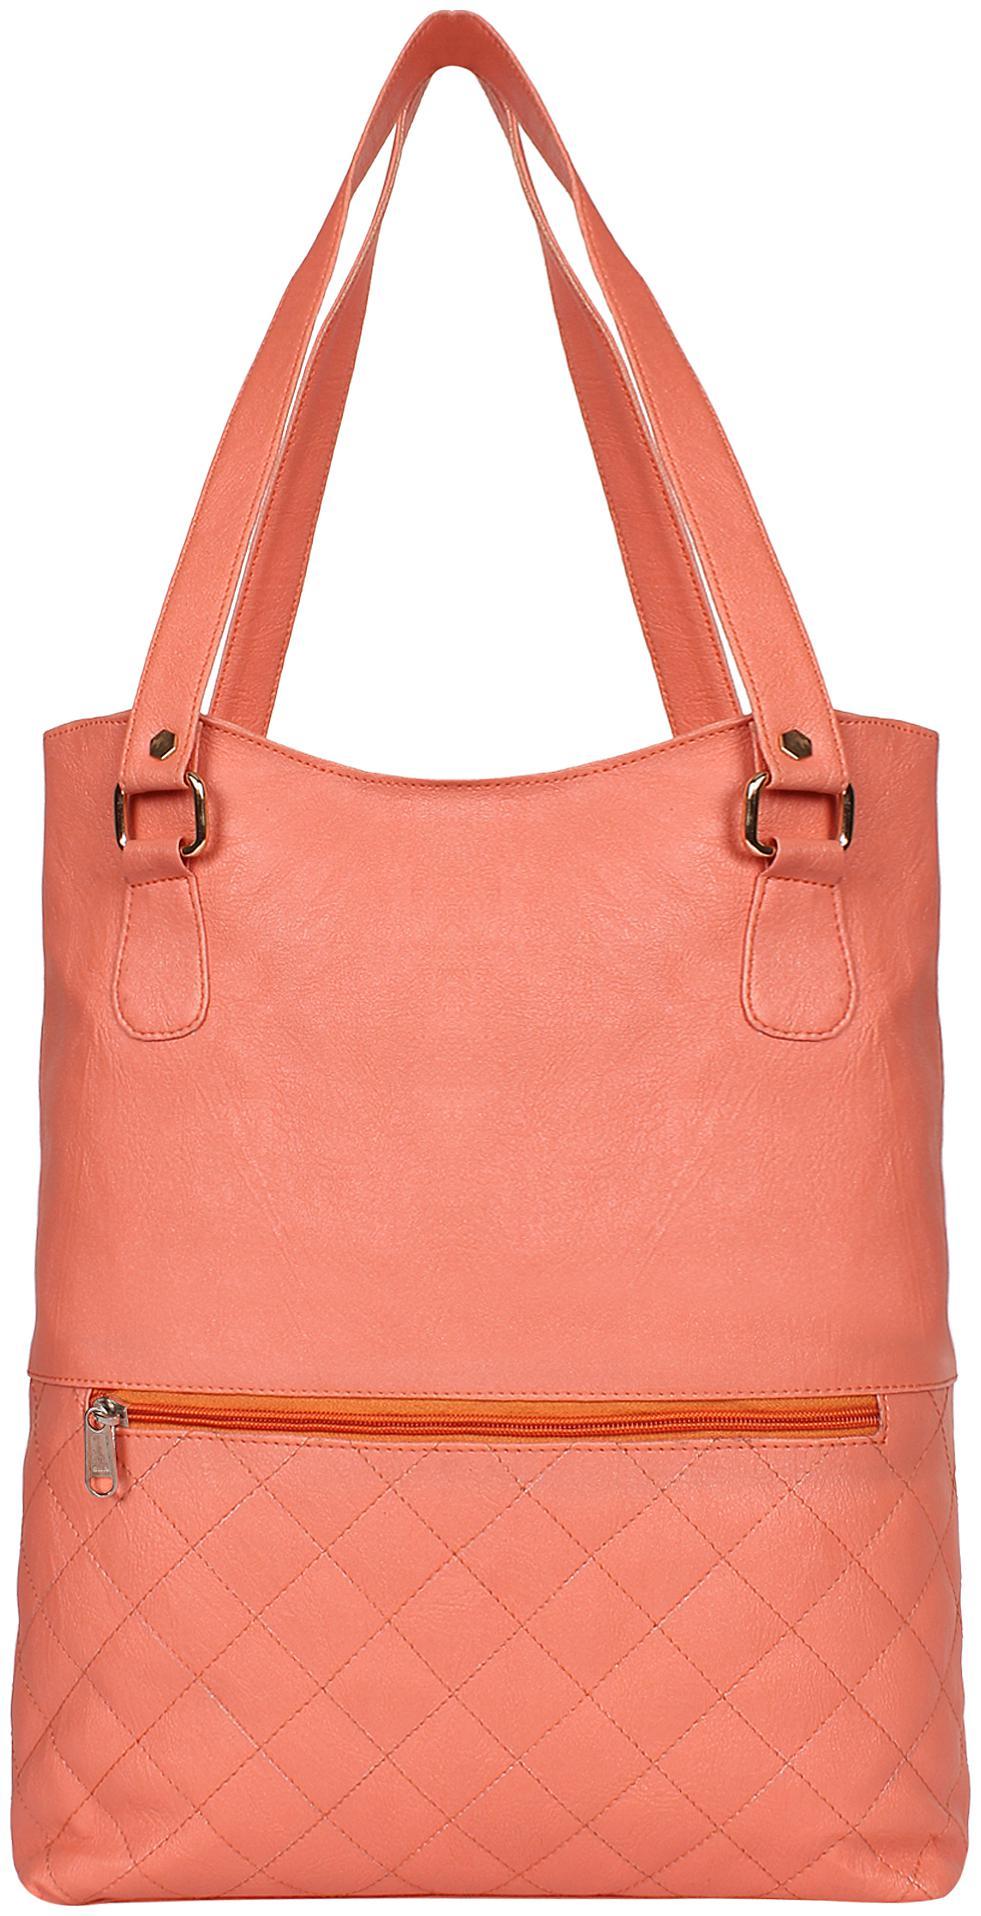 NIFTY FASHION   ACCESSORIES Orange Faux Leather   PU Shoulder Bag